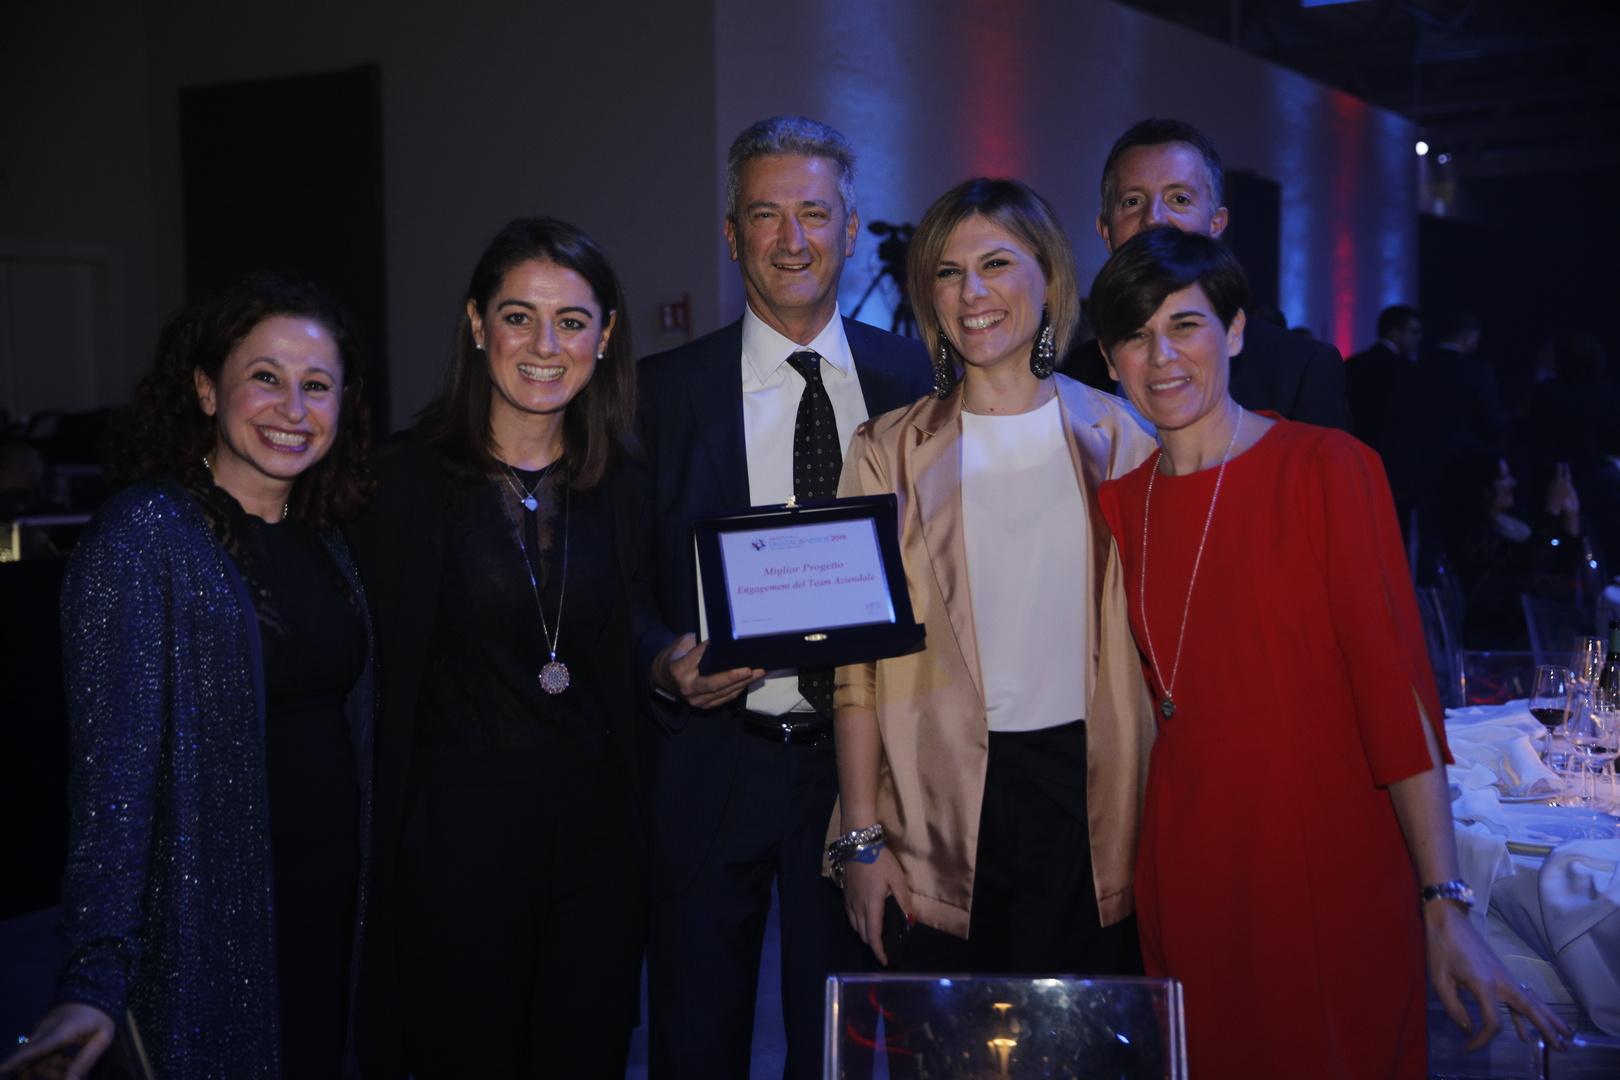 AboutPharma Digital Awards 2019 (83)